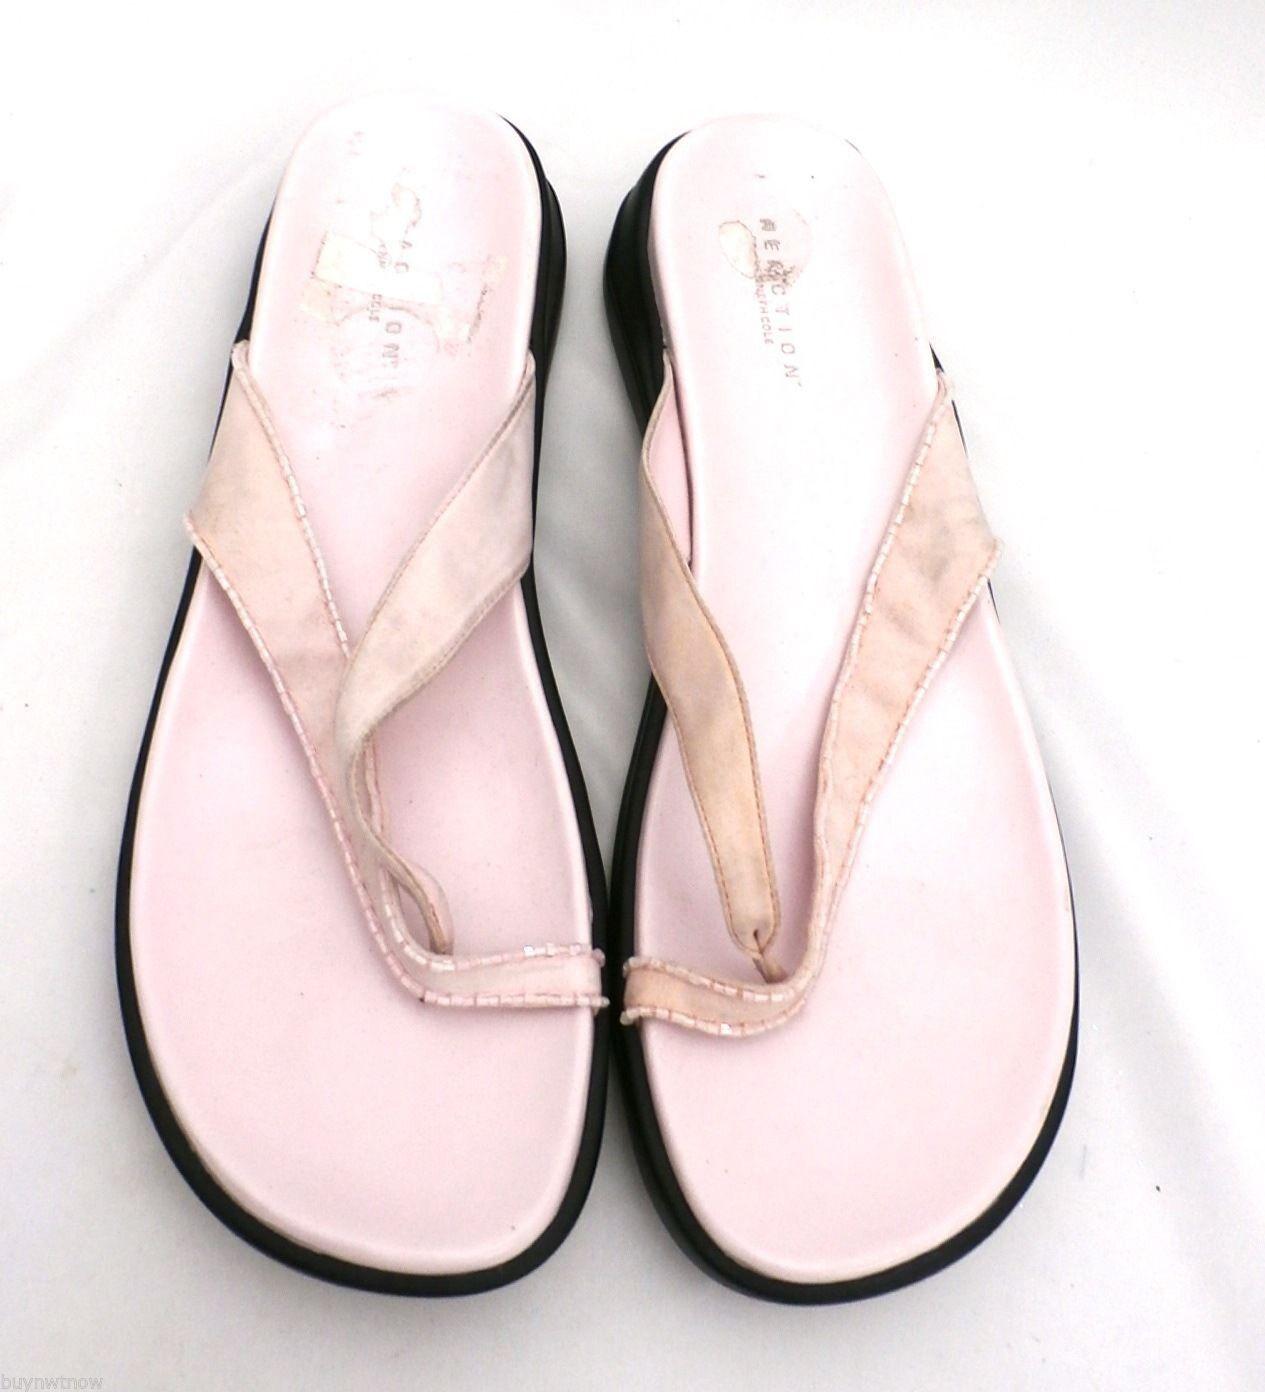 Kenneth Cole Reaction Pink Razzle Dazzle Thongs Flip Flops Sandals Womens 10